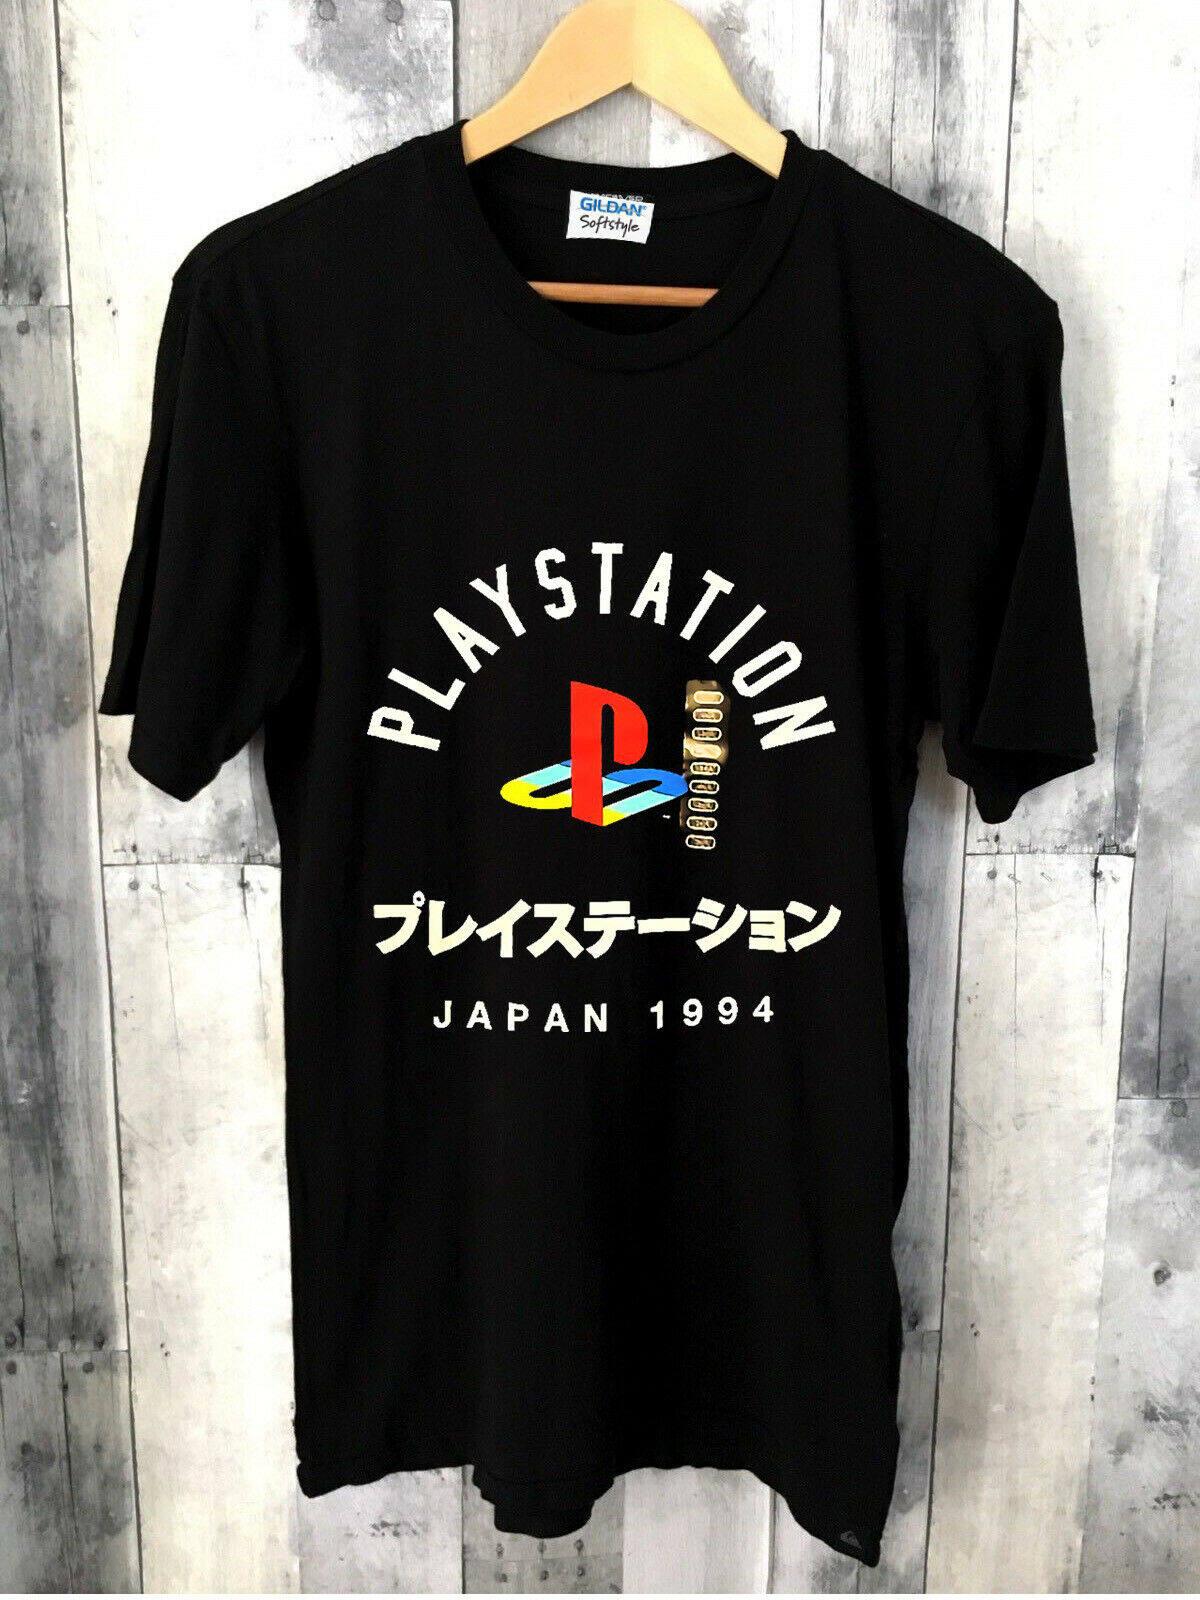 MITSUBISHI Ralliart Car Racing Gildan Ultra Black Heavy Cotton T-Shirt